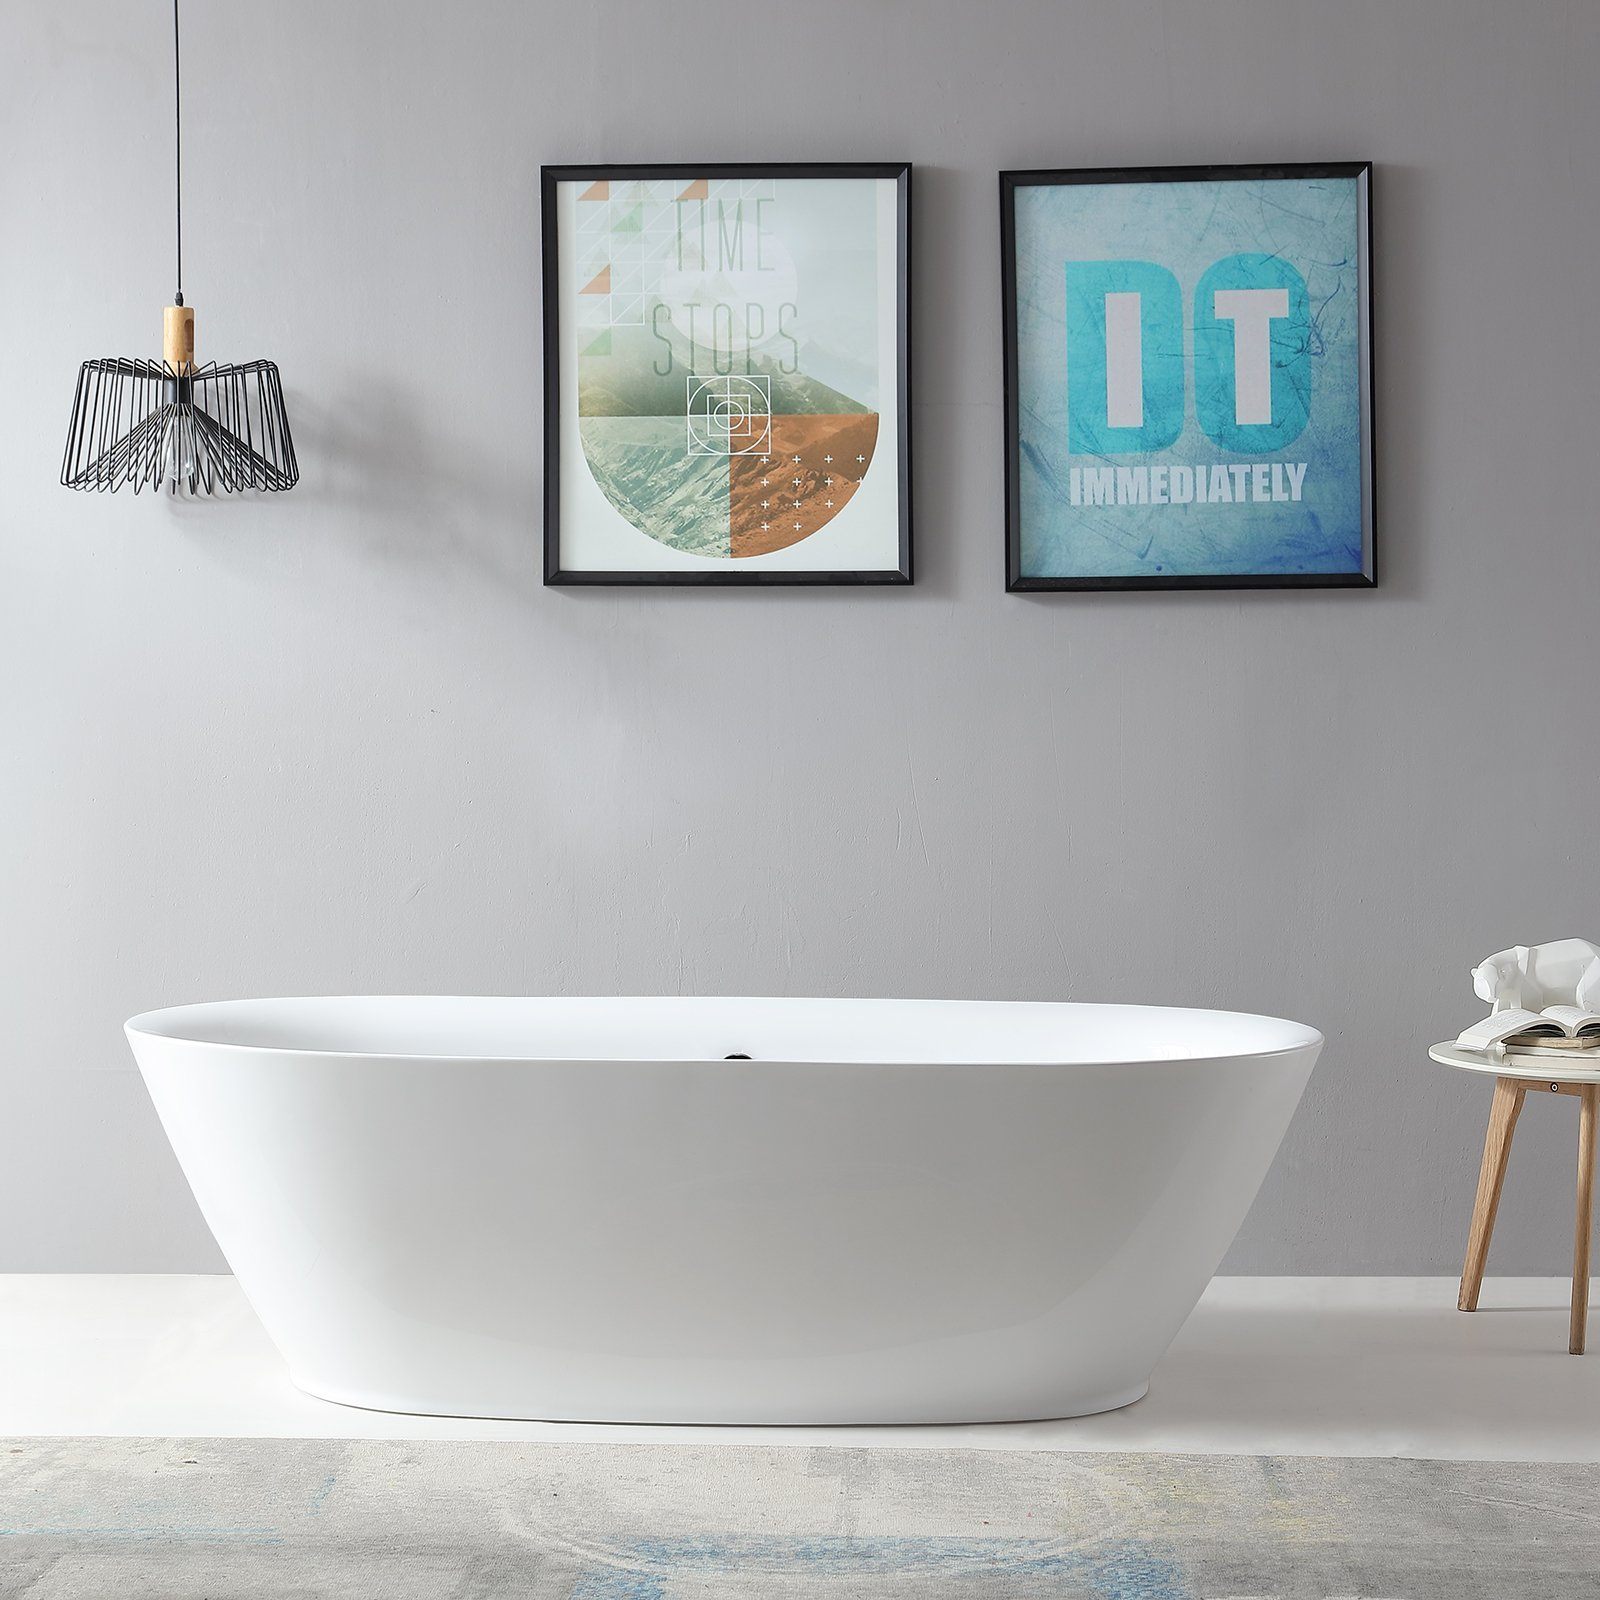 Freistehende Badewanne ROMA ACRYL weiß BS-916 180x84 inkl. Ab/ Überlauf zoom thumbnail 3